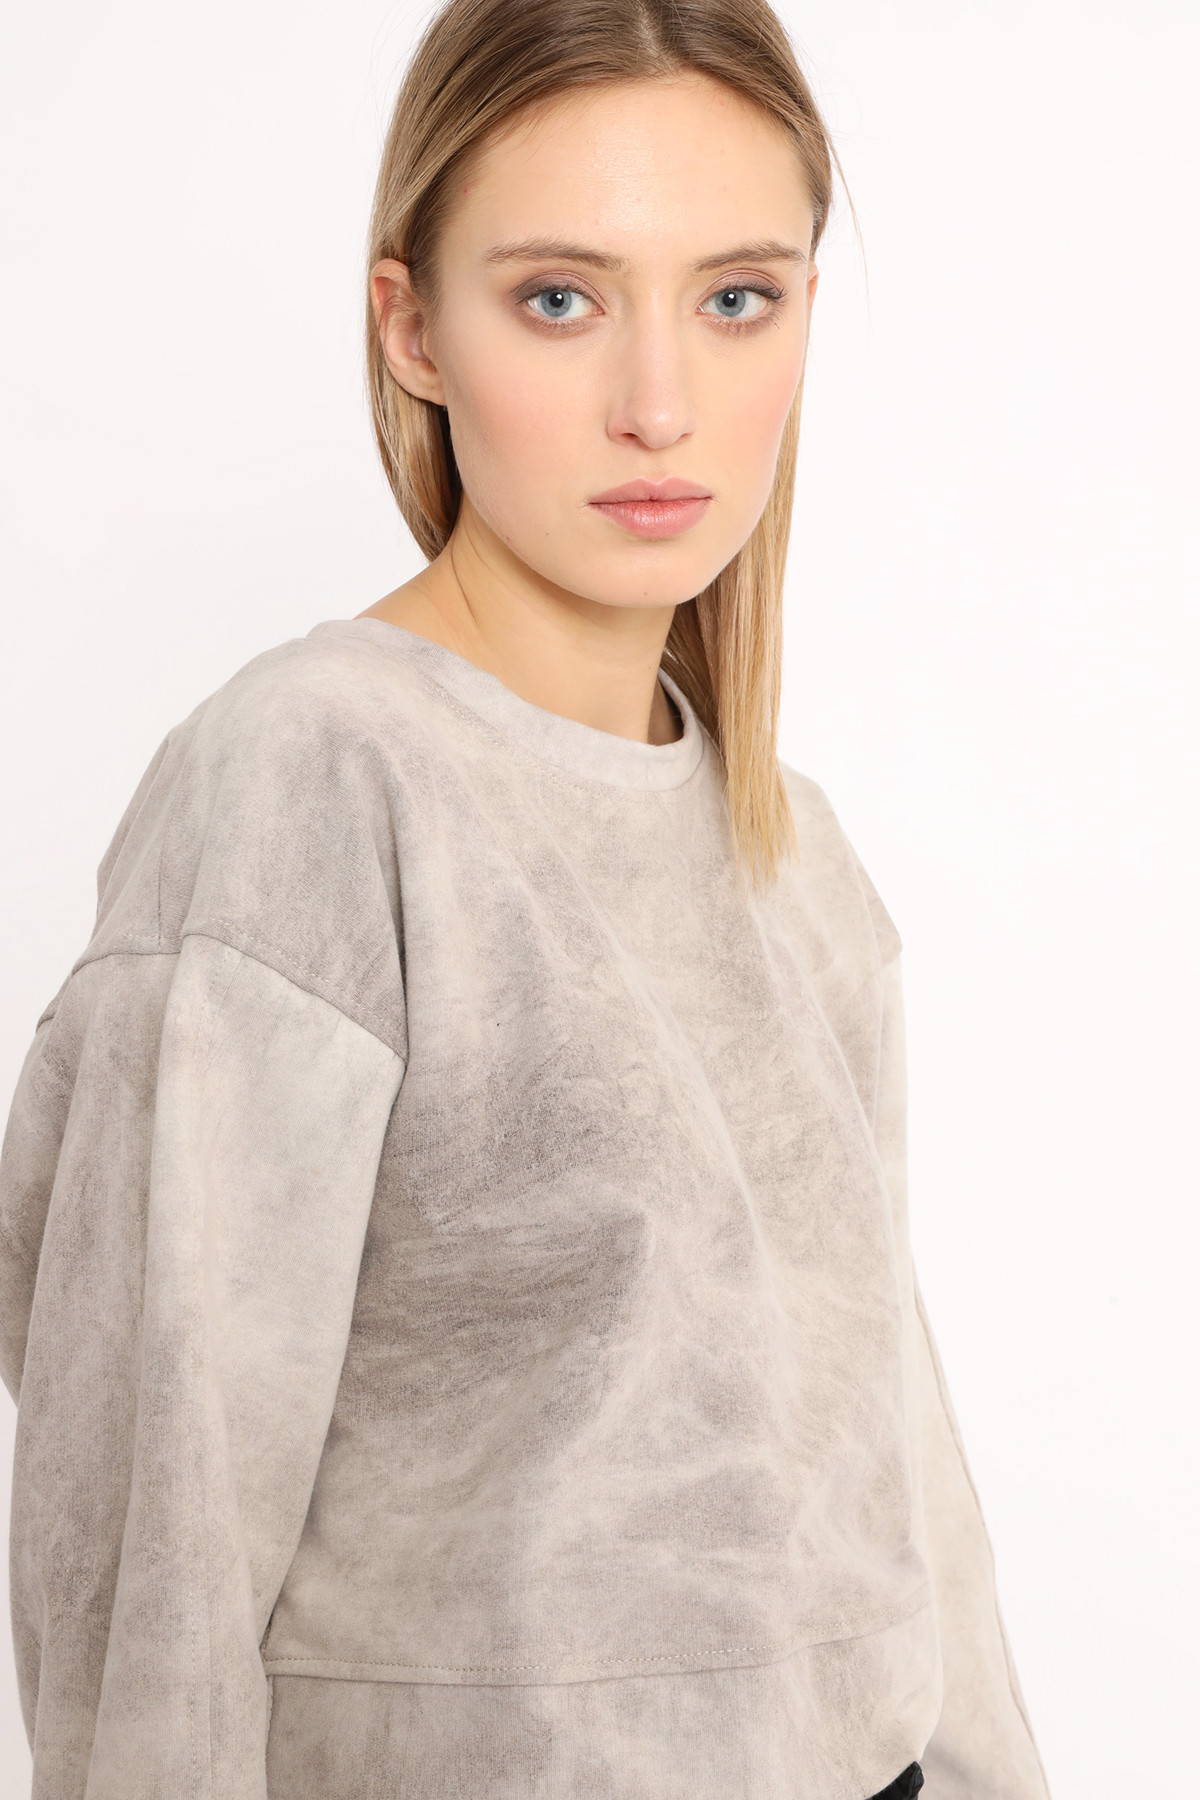 Marbled Crewneck Sweatshirt